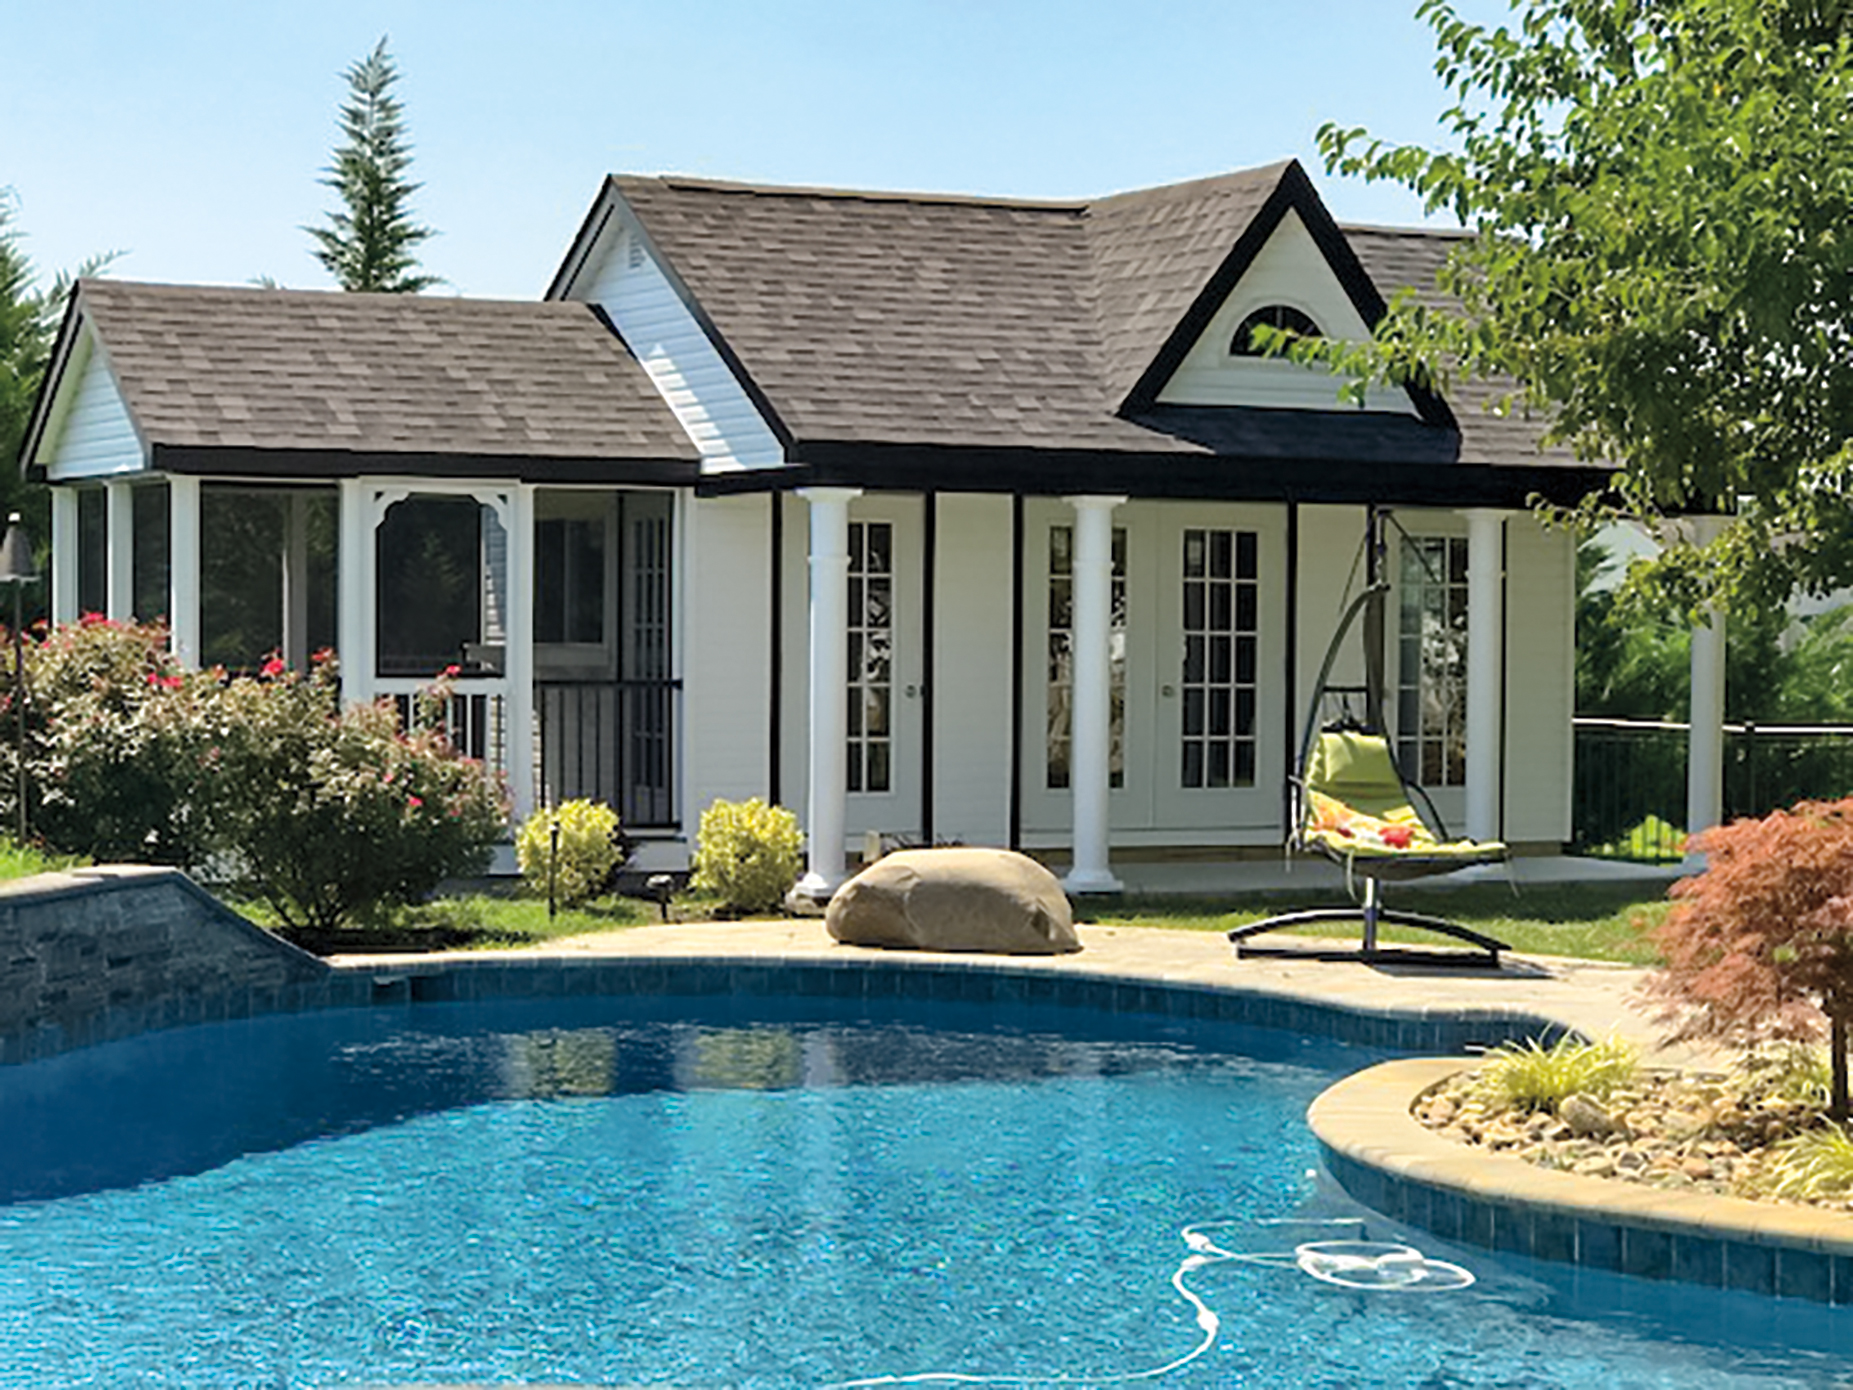 10x20 Pool House